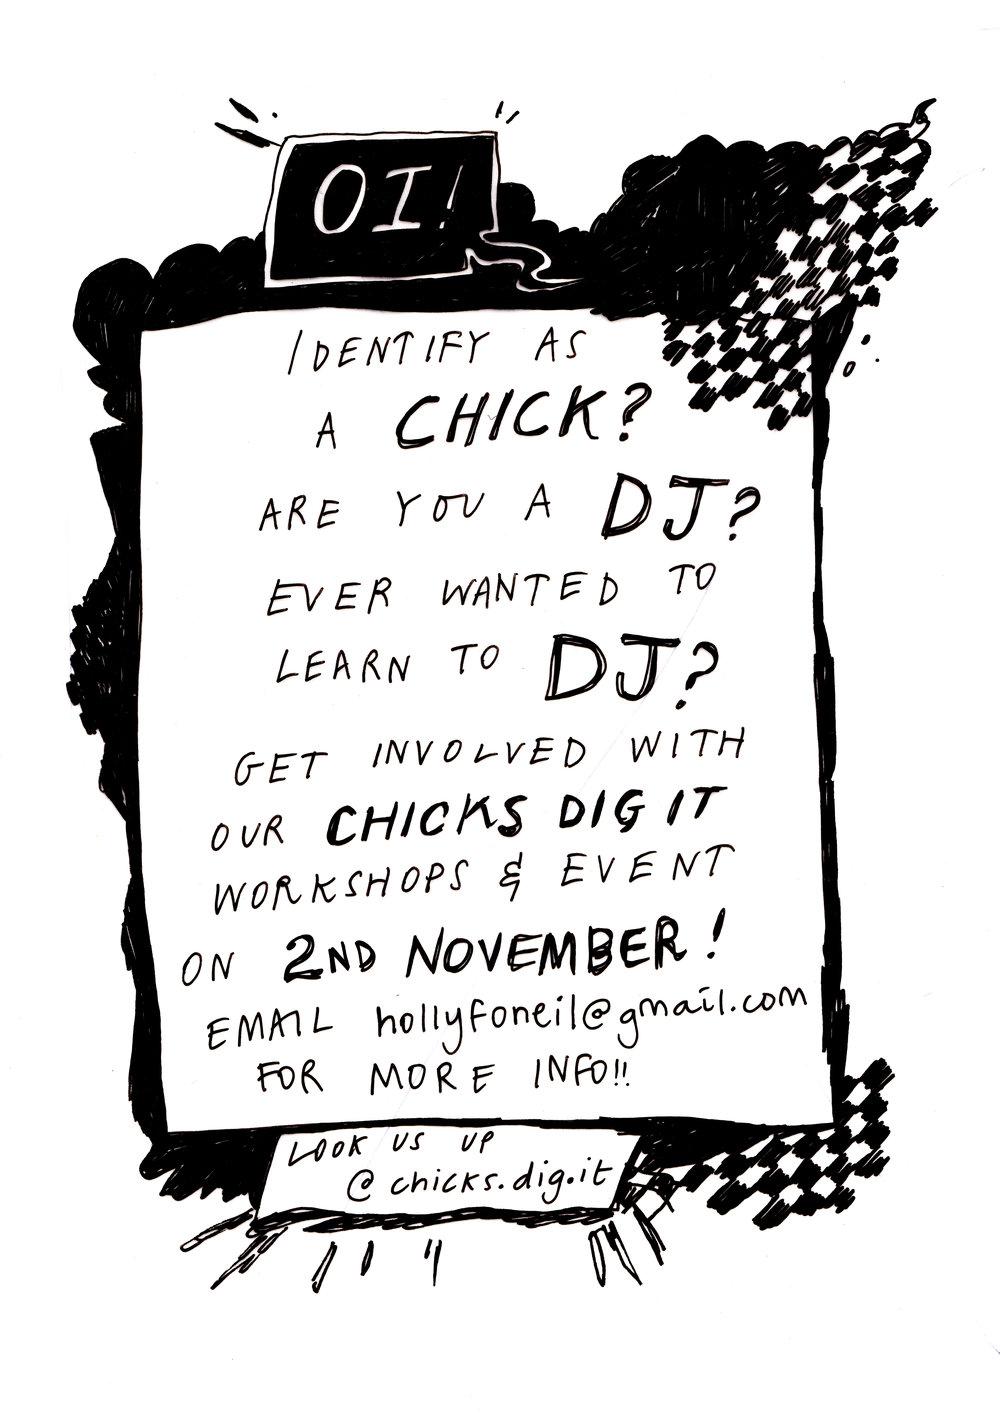 chickscallout.jpg